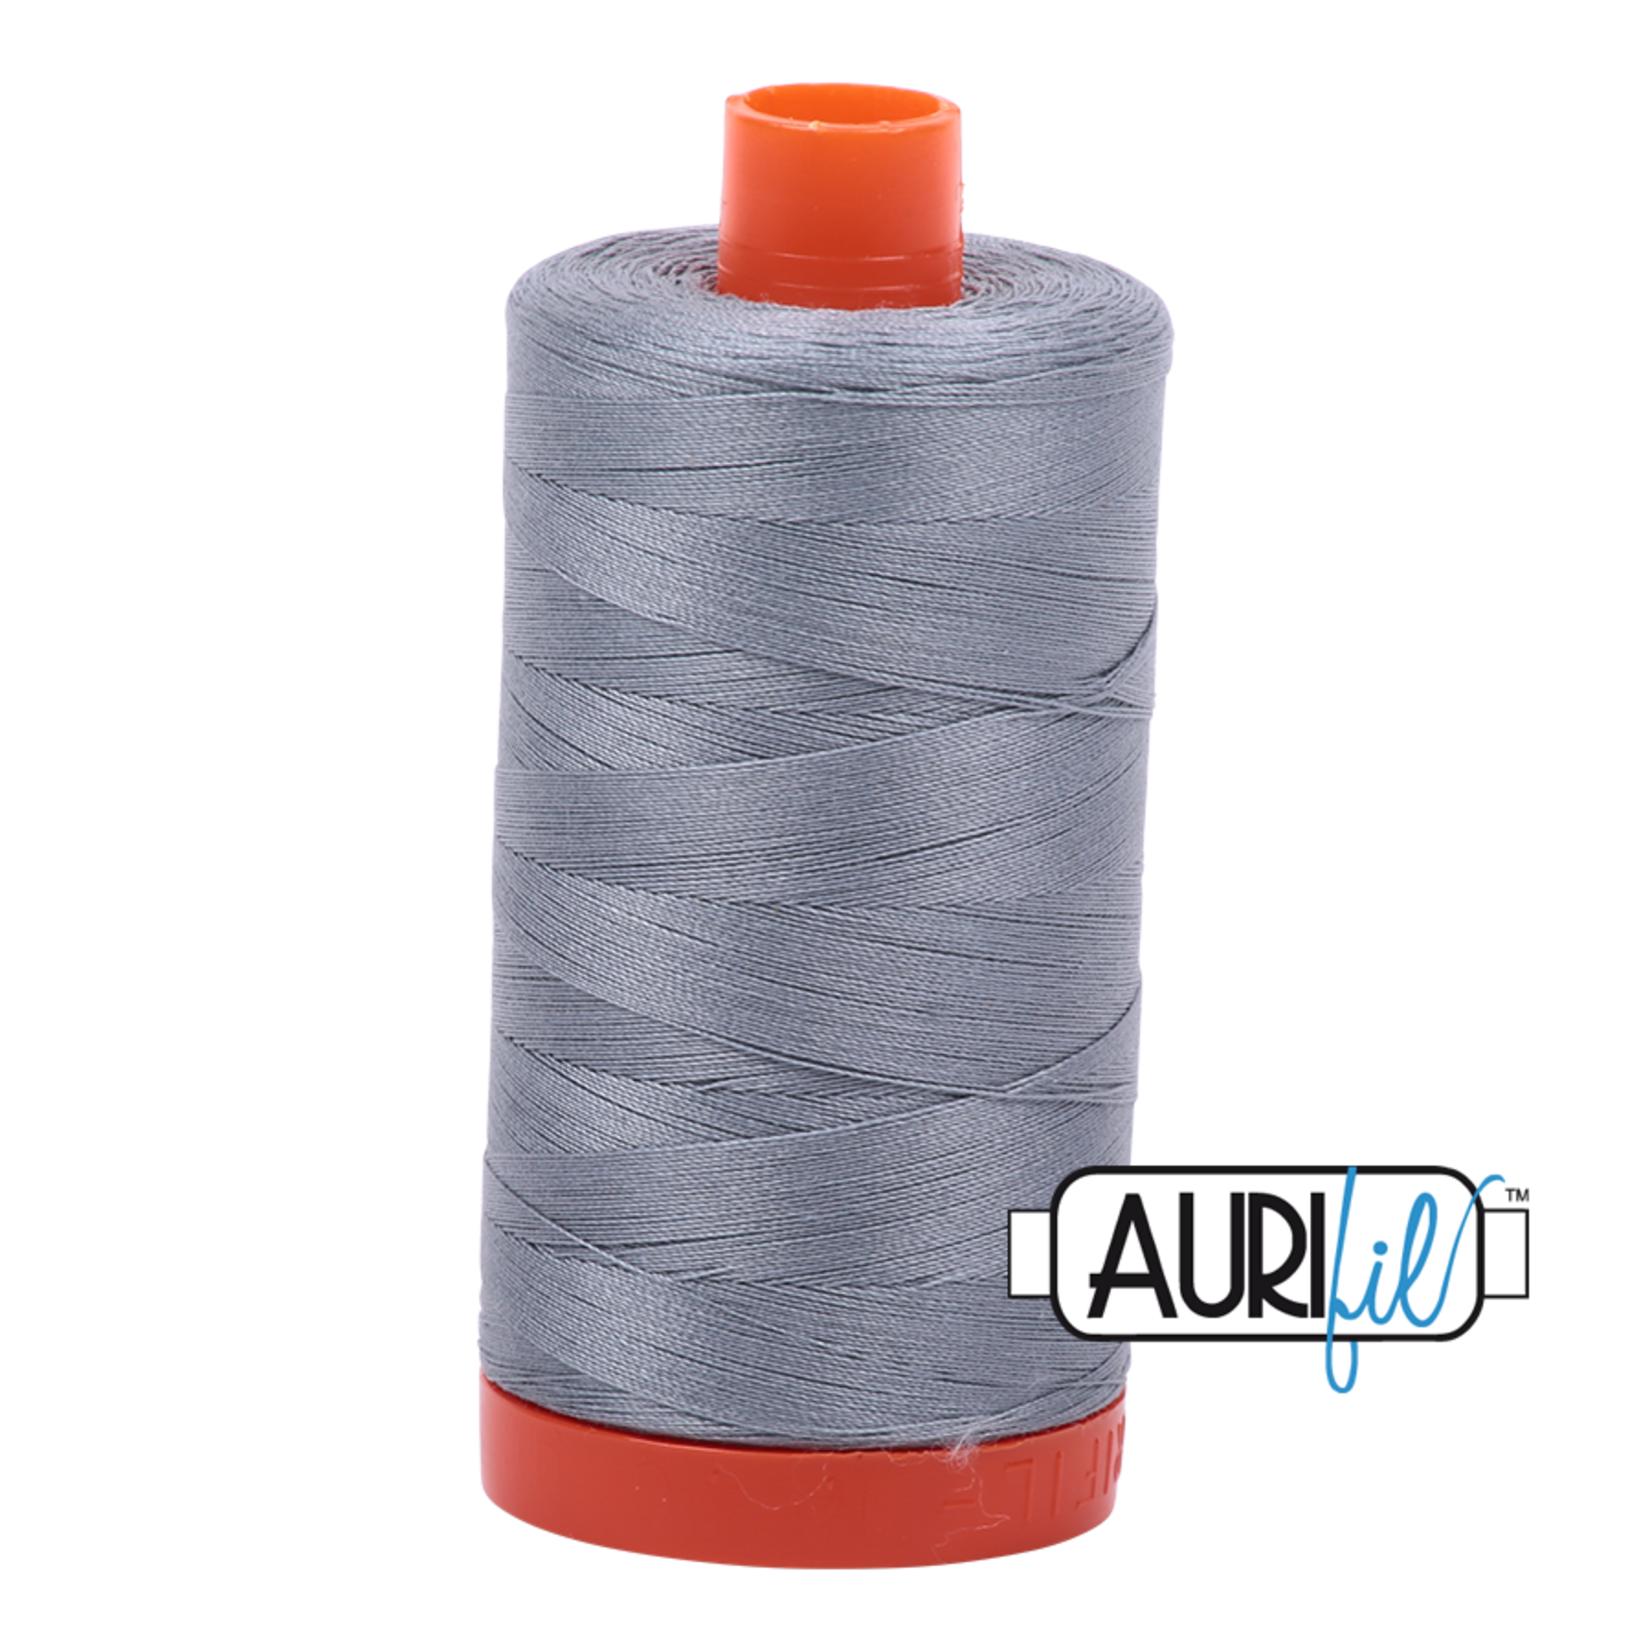 AURIFIL AURIFIL 50 WT Light Blue Grey 2610